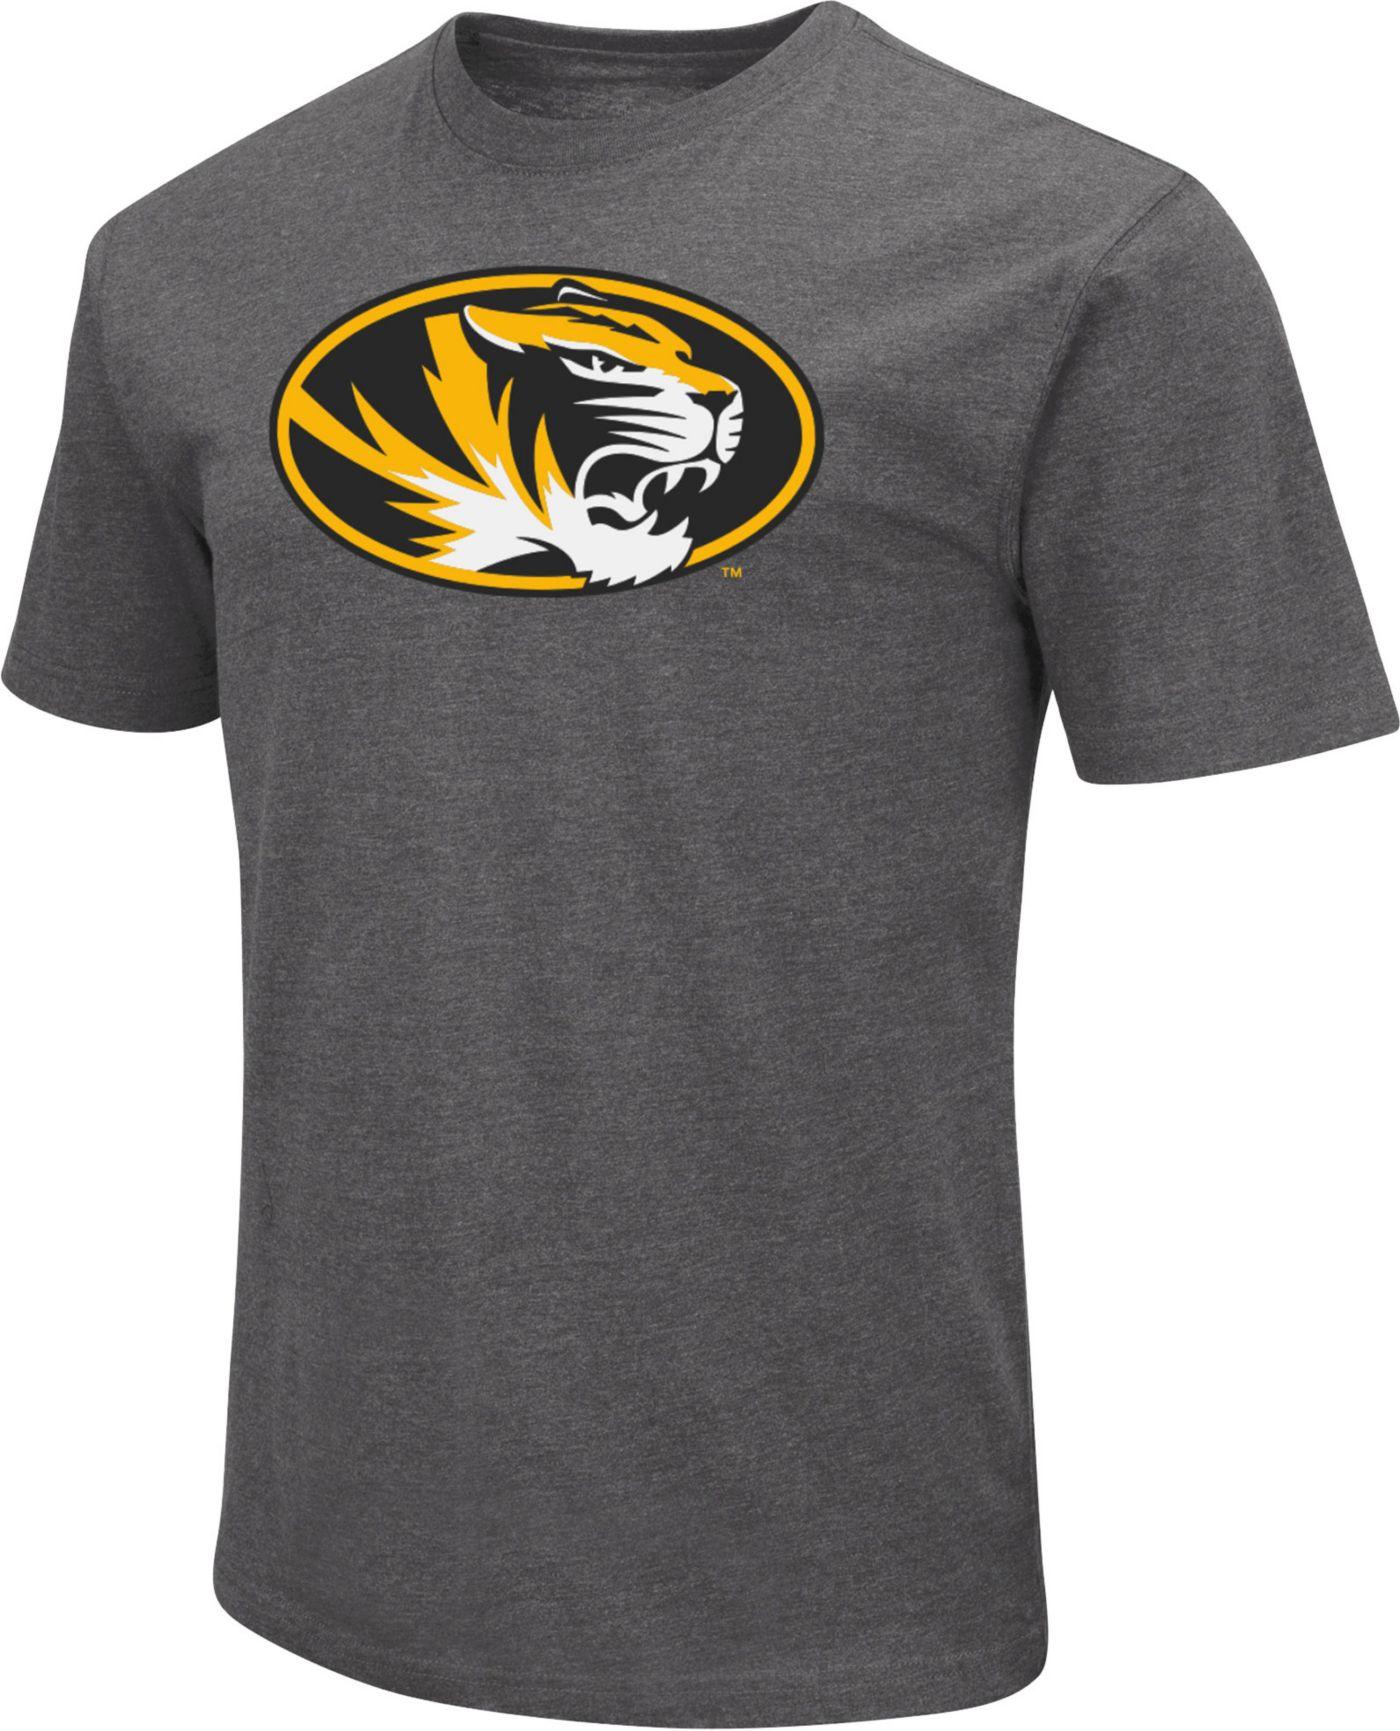 Colosseum Men's Missouri Tigers Grey Dual Blend T-Shirt